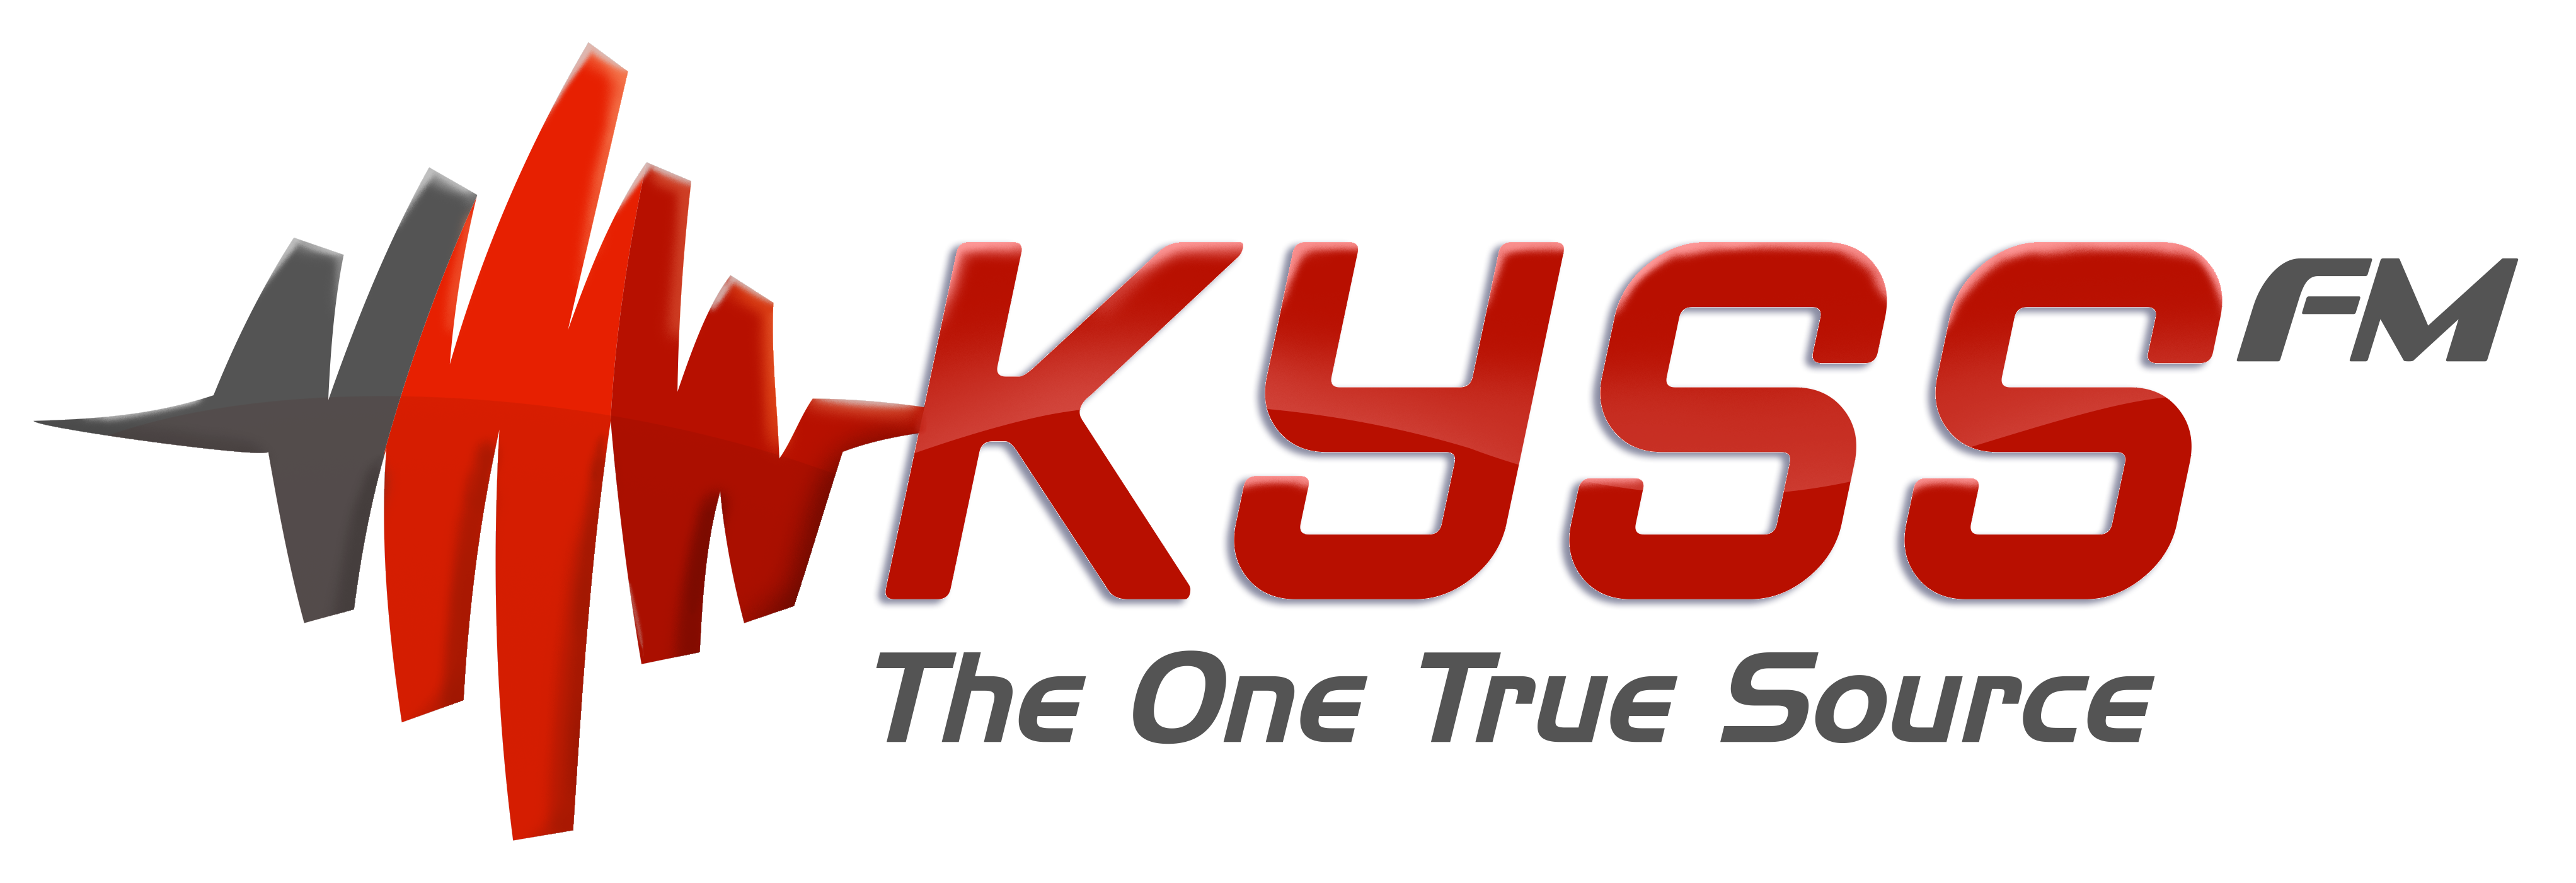 Kyss FM 102.5